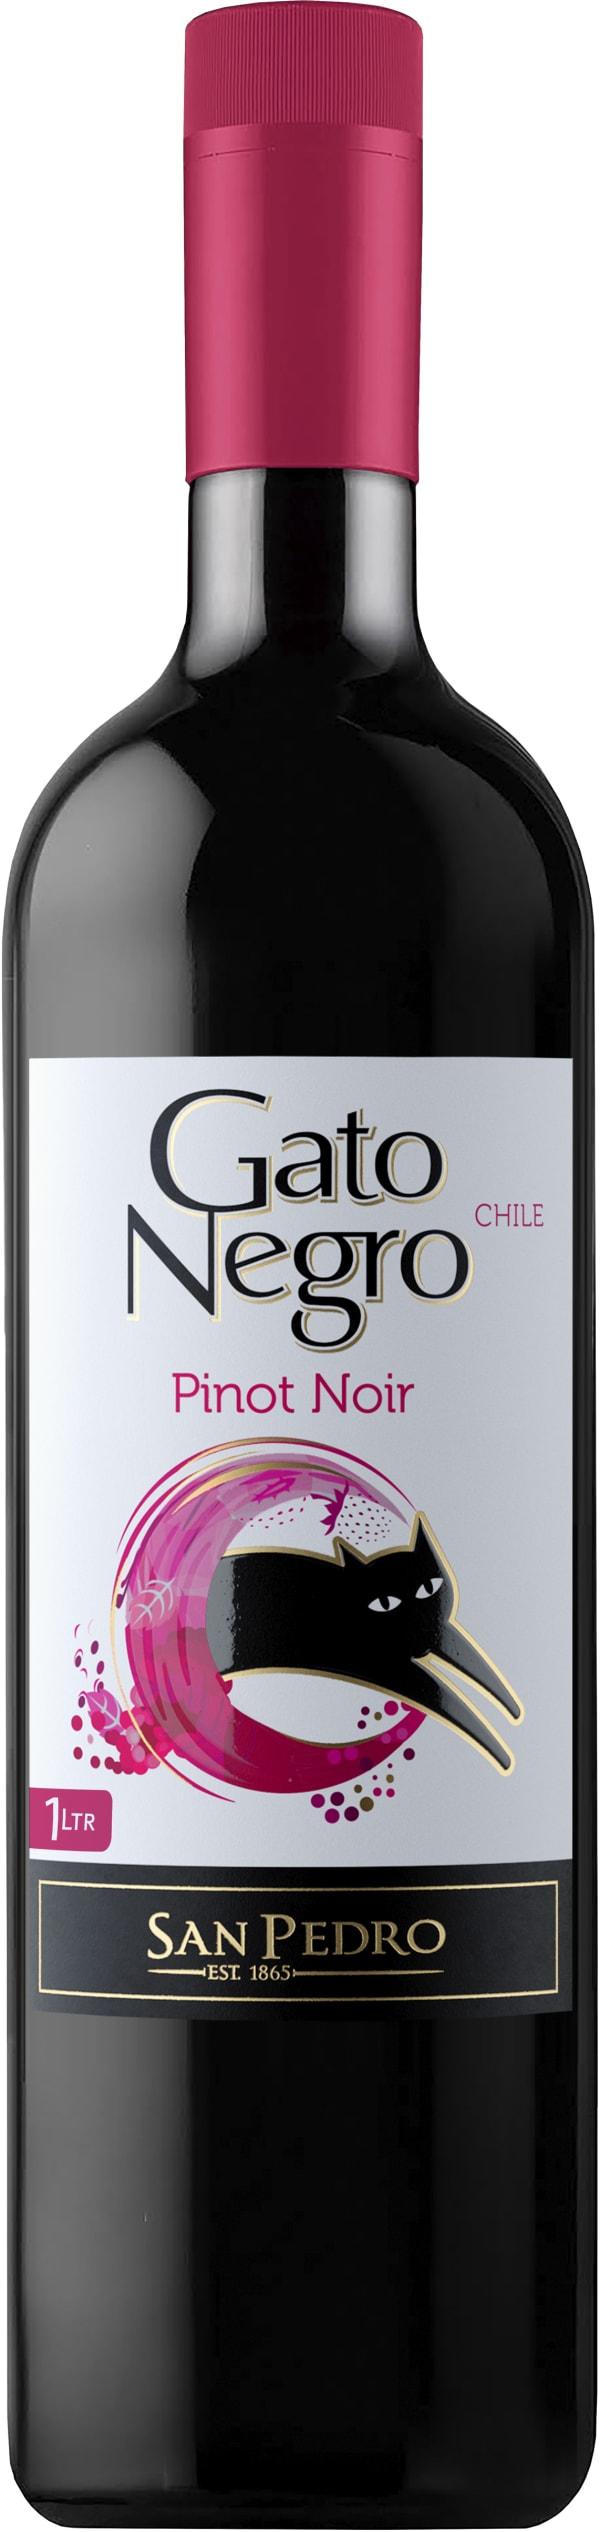 Gato Negro Pinot Noir 2015 muovipullo